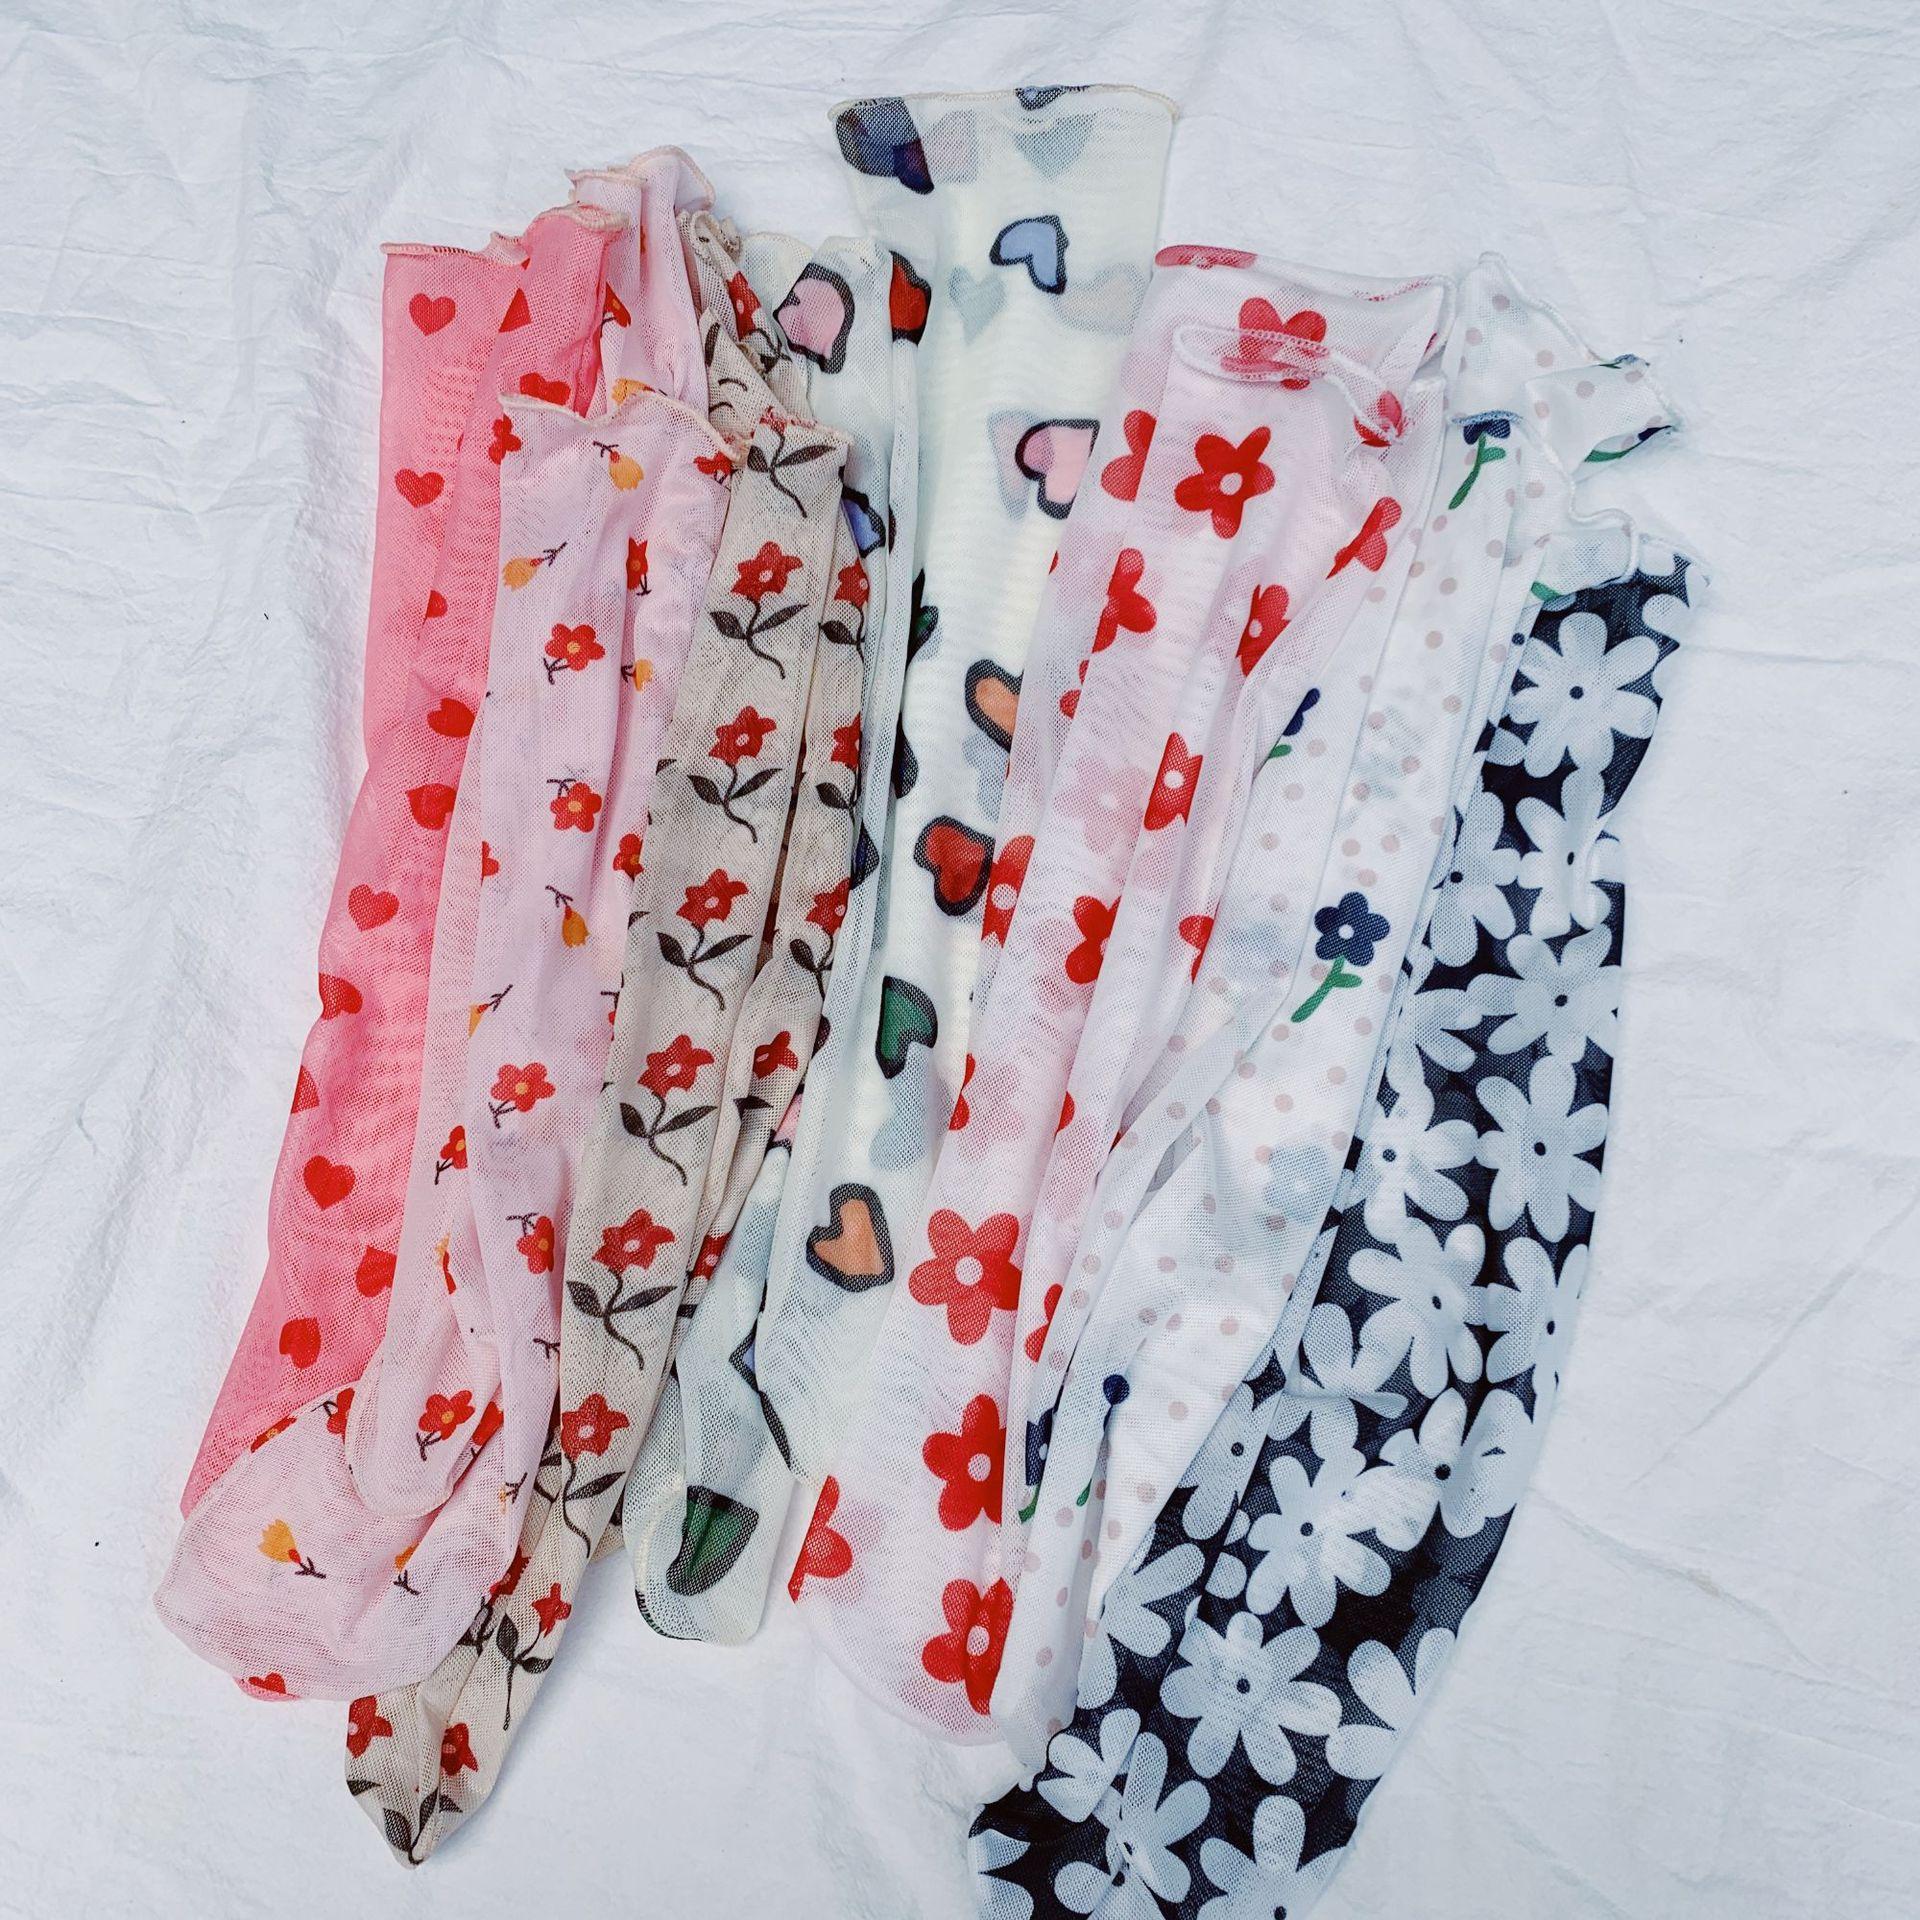 Harajuku Kawaii Funny   Socks   Women Streetwear Korean Style Women Mesh Fishnet   Socks   Cute Sheer Fishnet   Sock   Ladies Pink Sokken